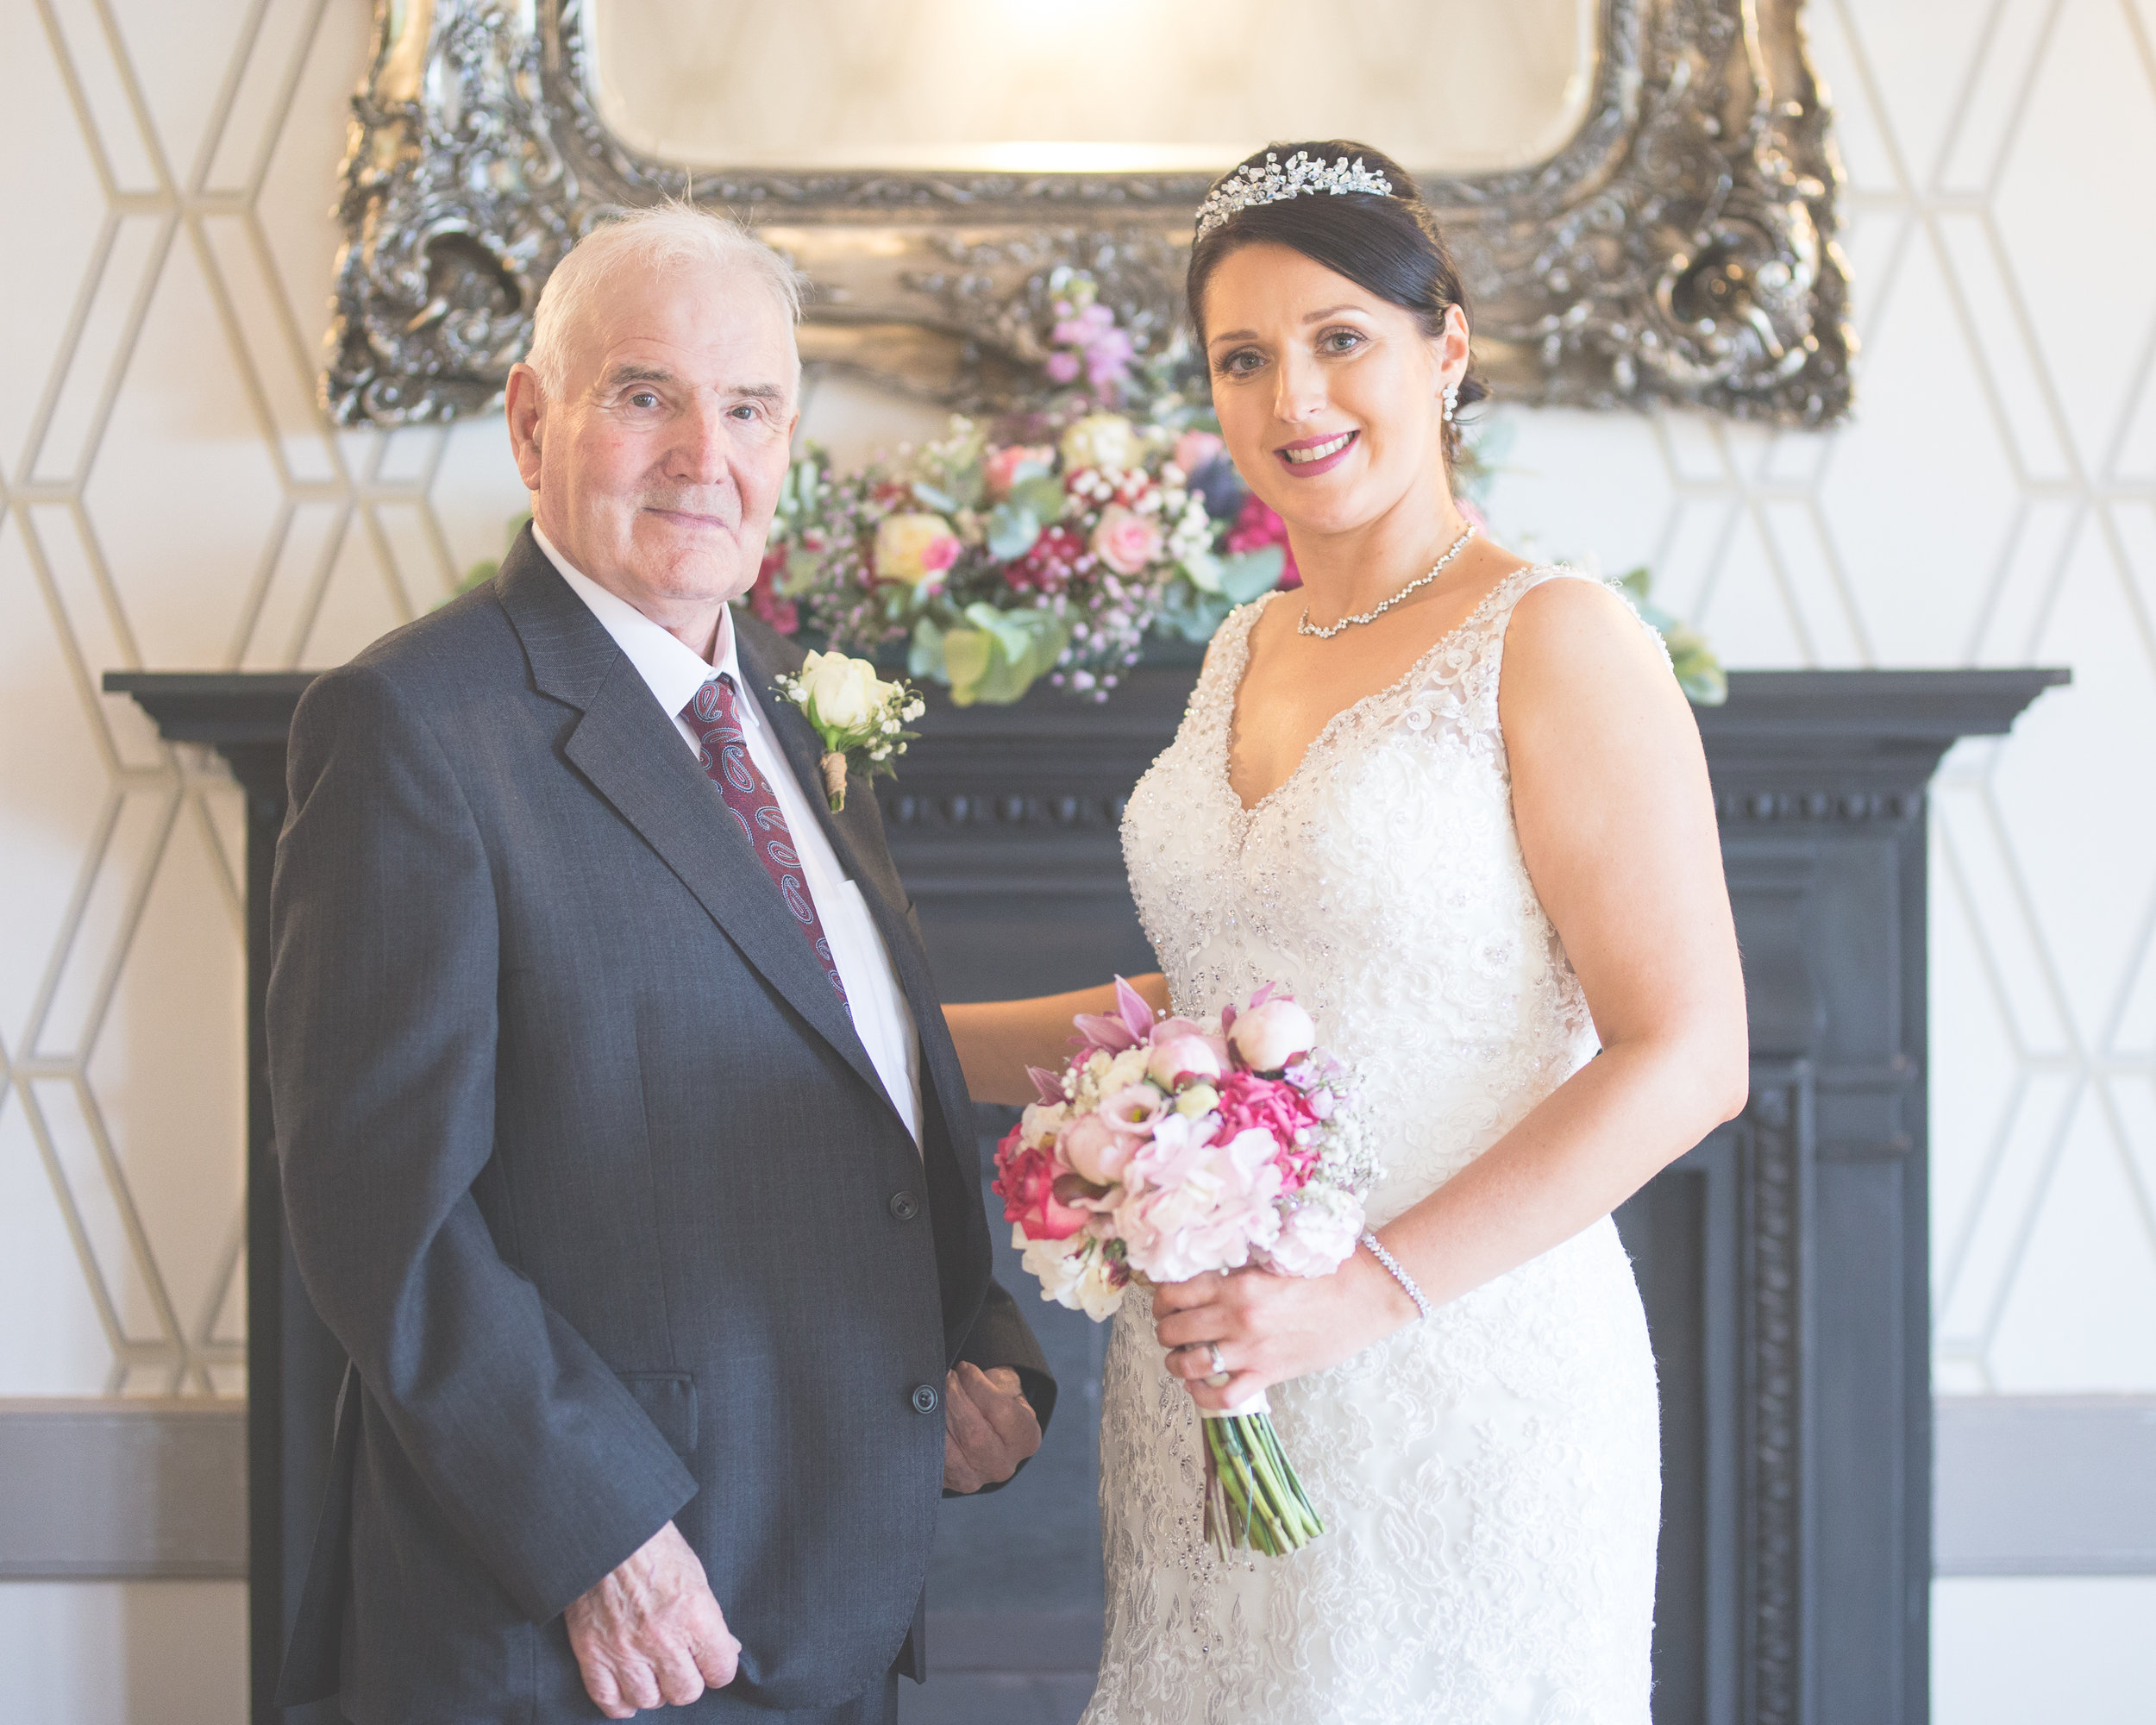 Northern Ireland Wedding Photographer | Brian McEwan | Louise & Darren-339.jpg